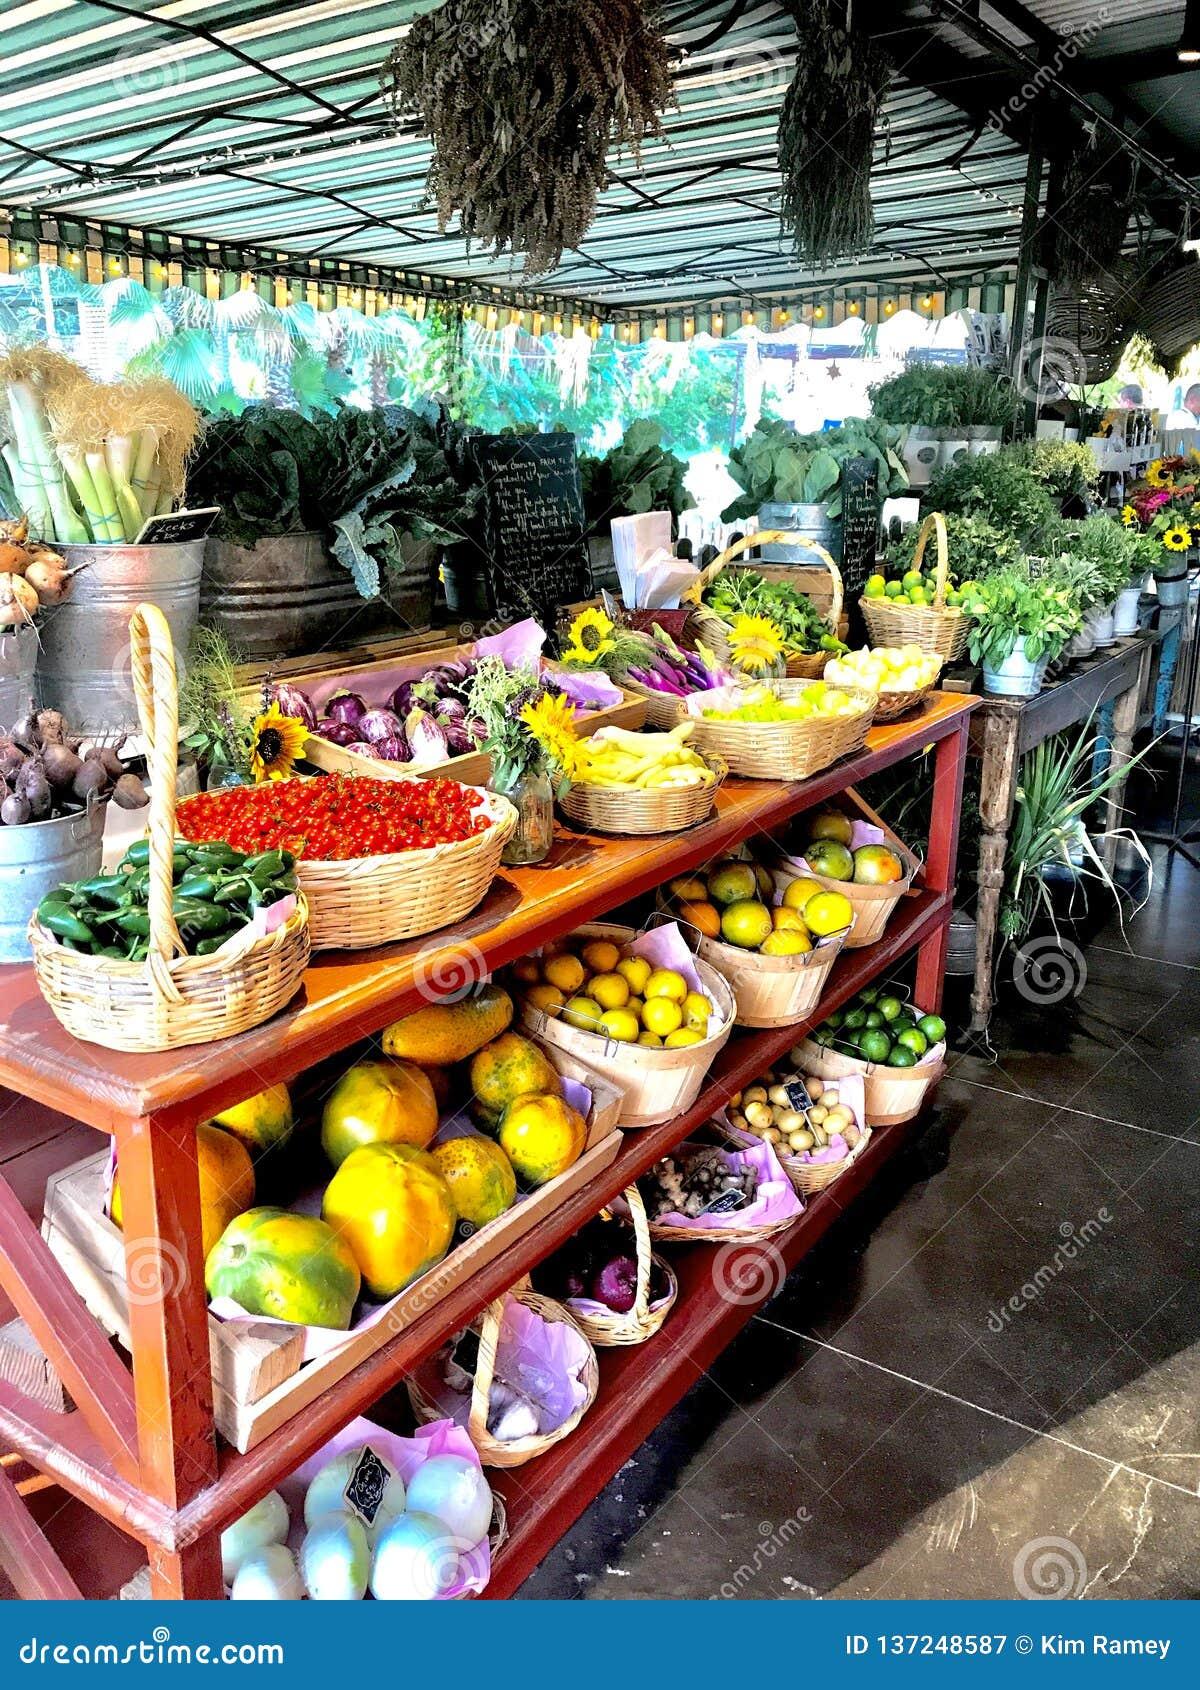 Flora Farms Fruit and Veggie Display